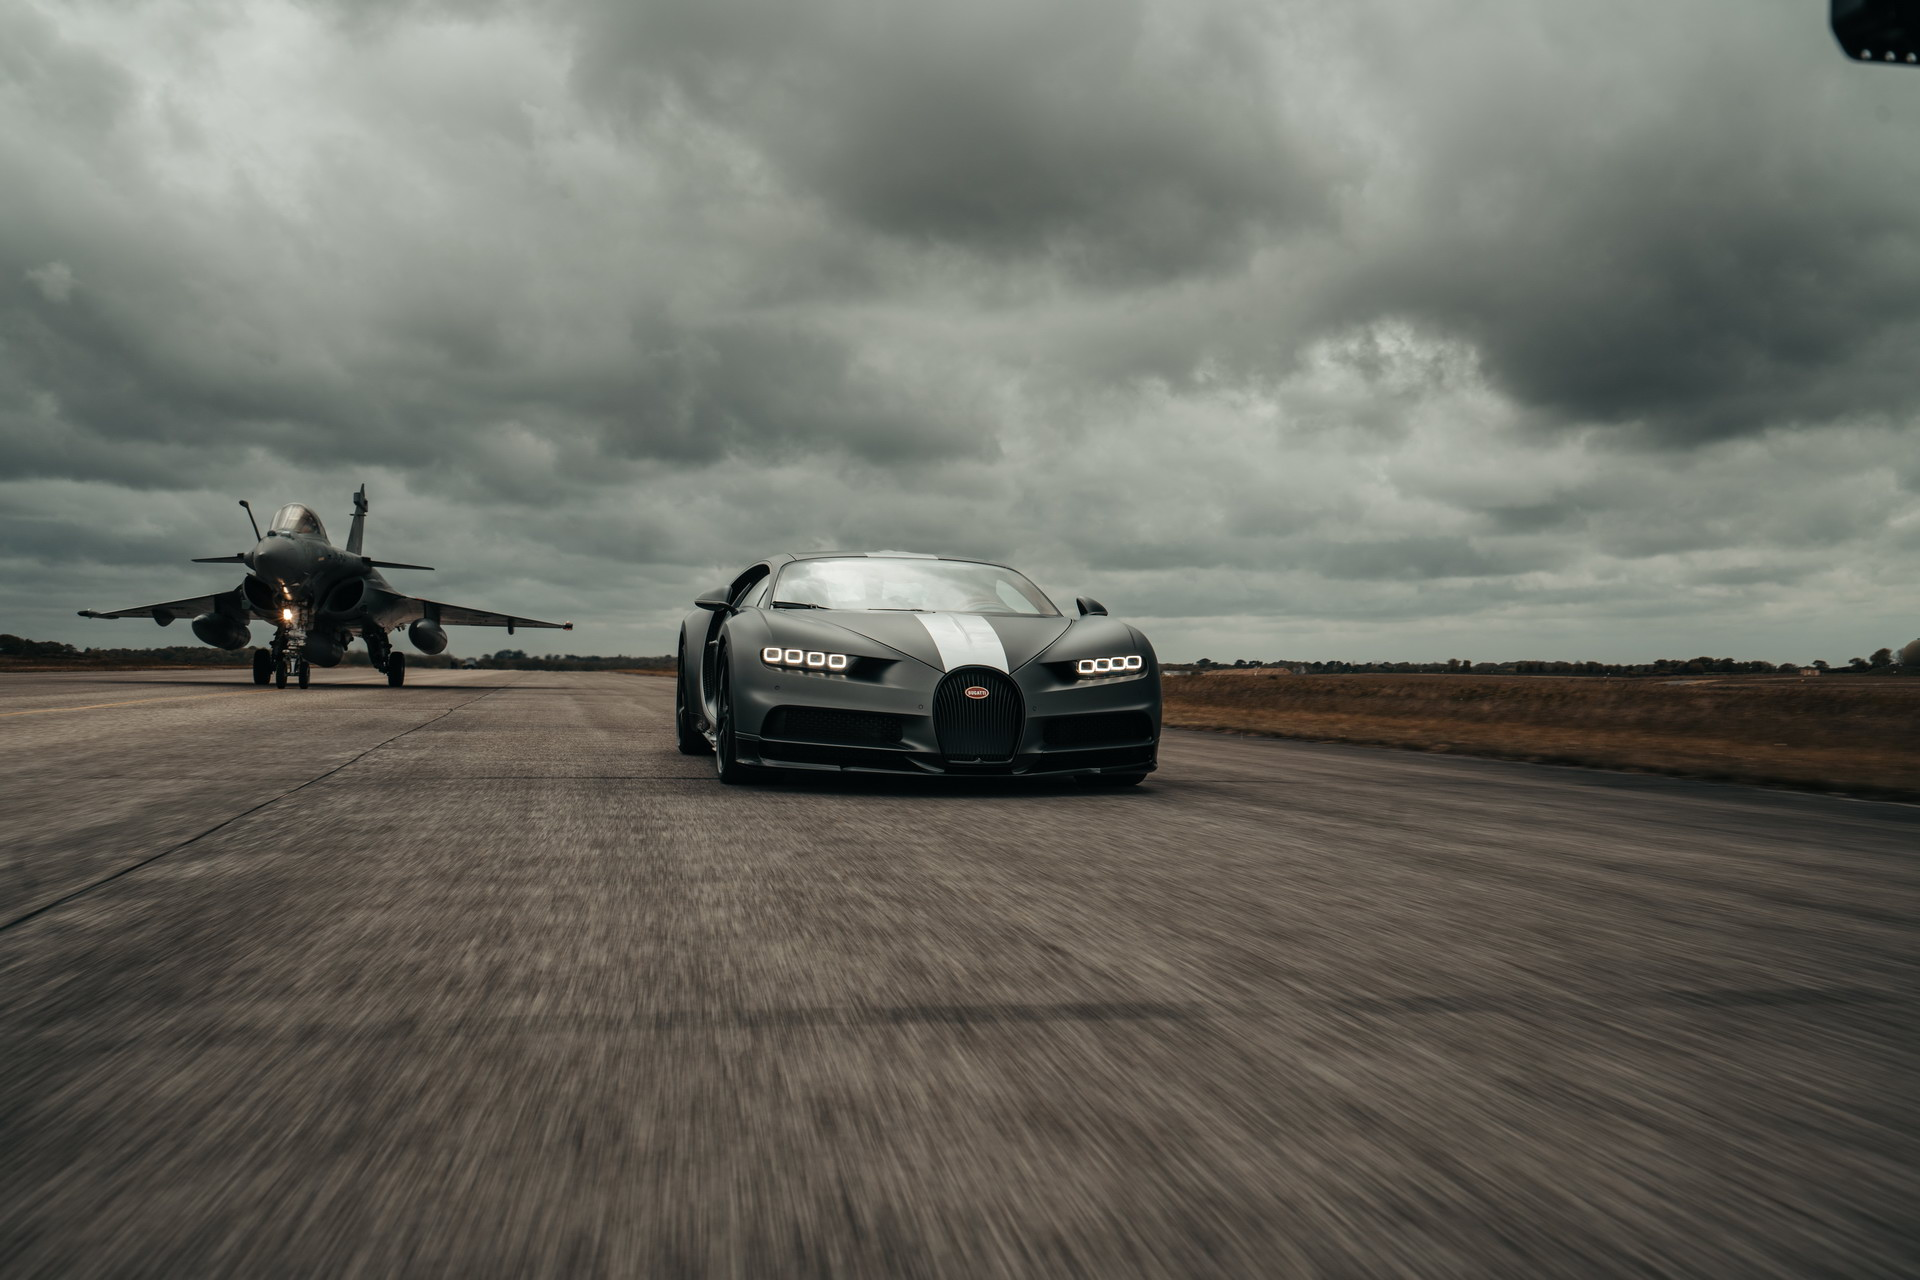 Bugatti Chiron Sport vs Dassault Rafale Jet Fighter - SIÊU XE 1,480 HP vs CHIẾN ĐẤU CƠ 5,646 HP